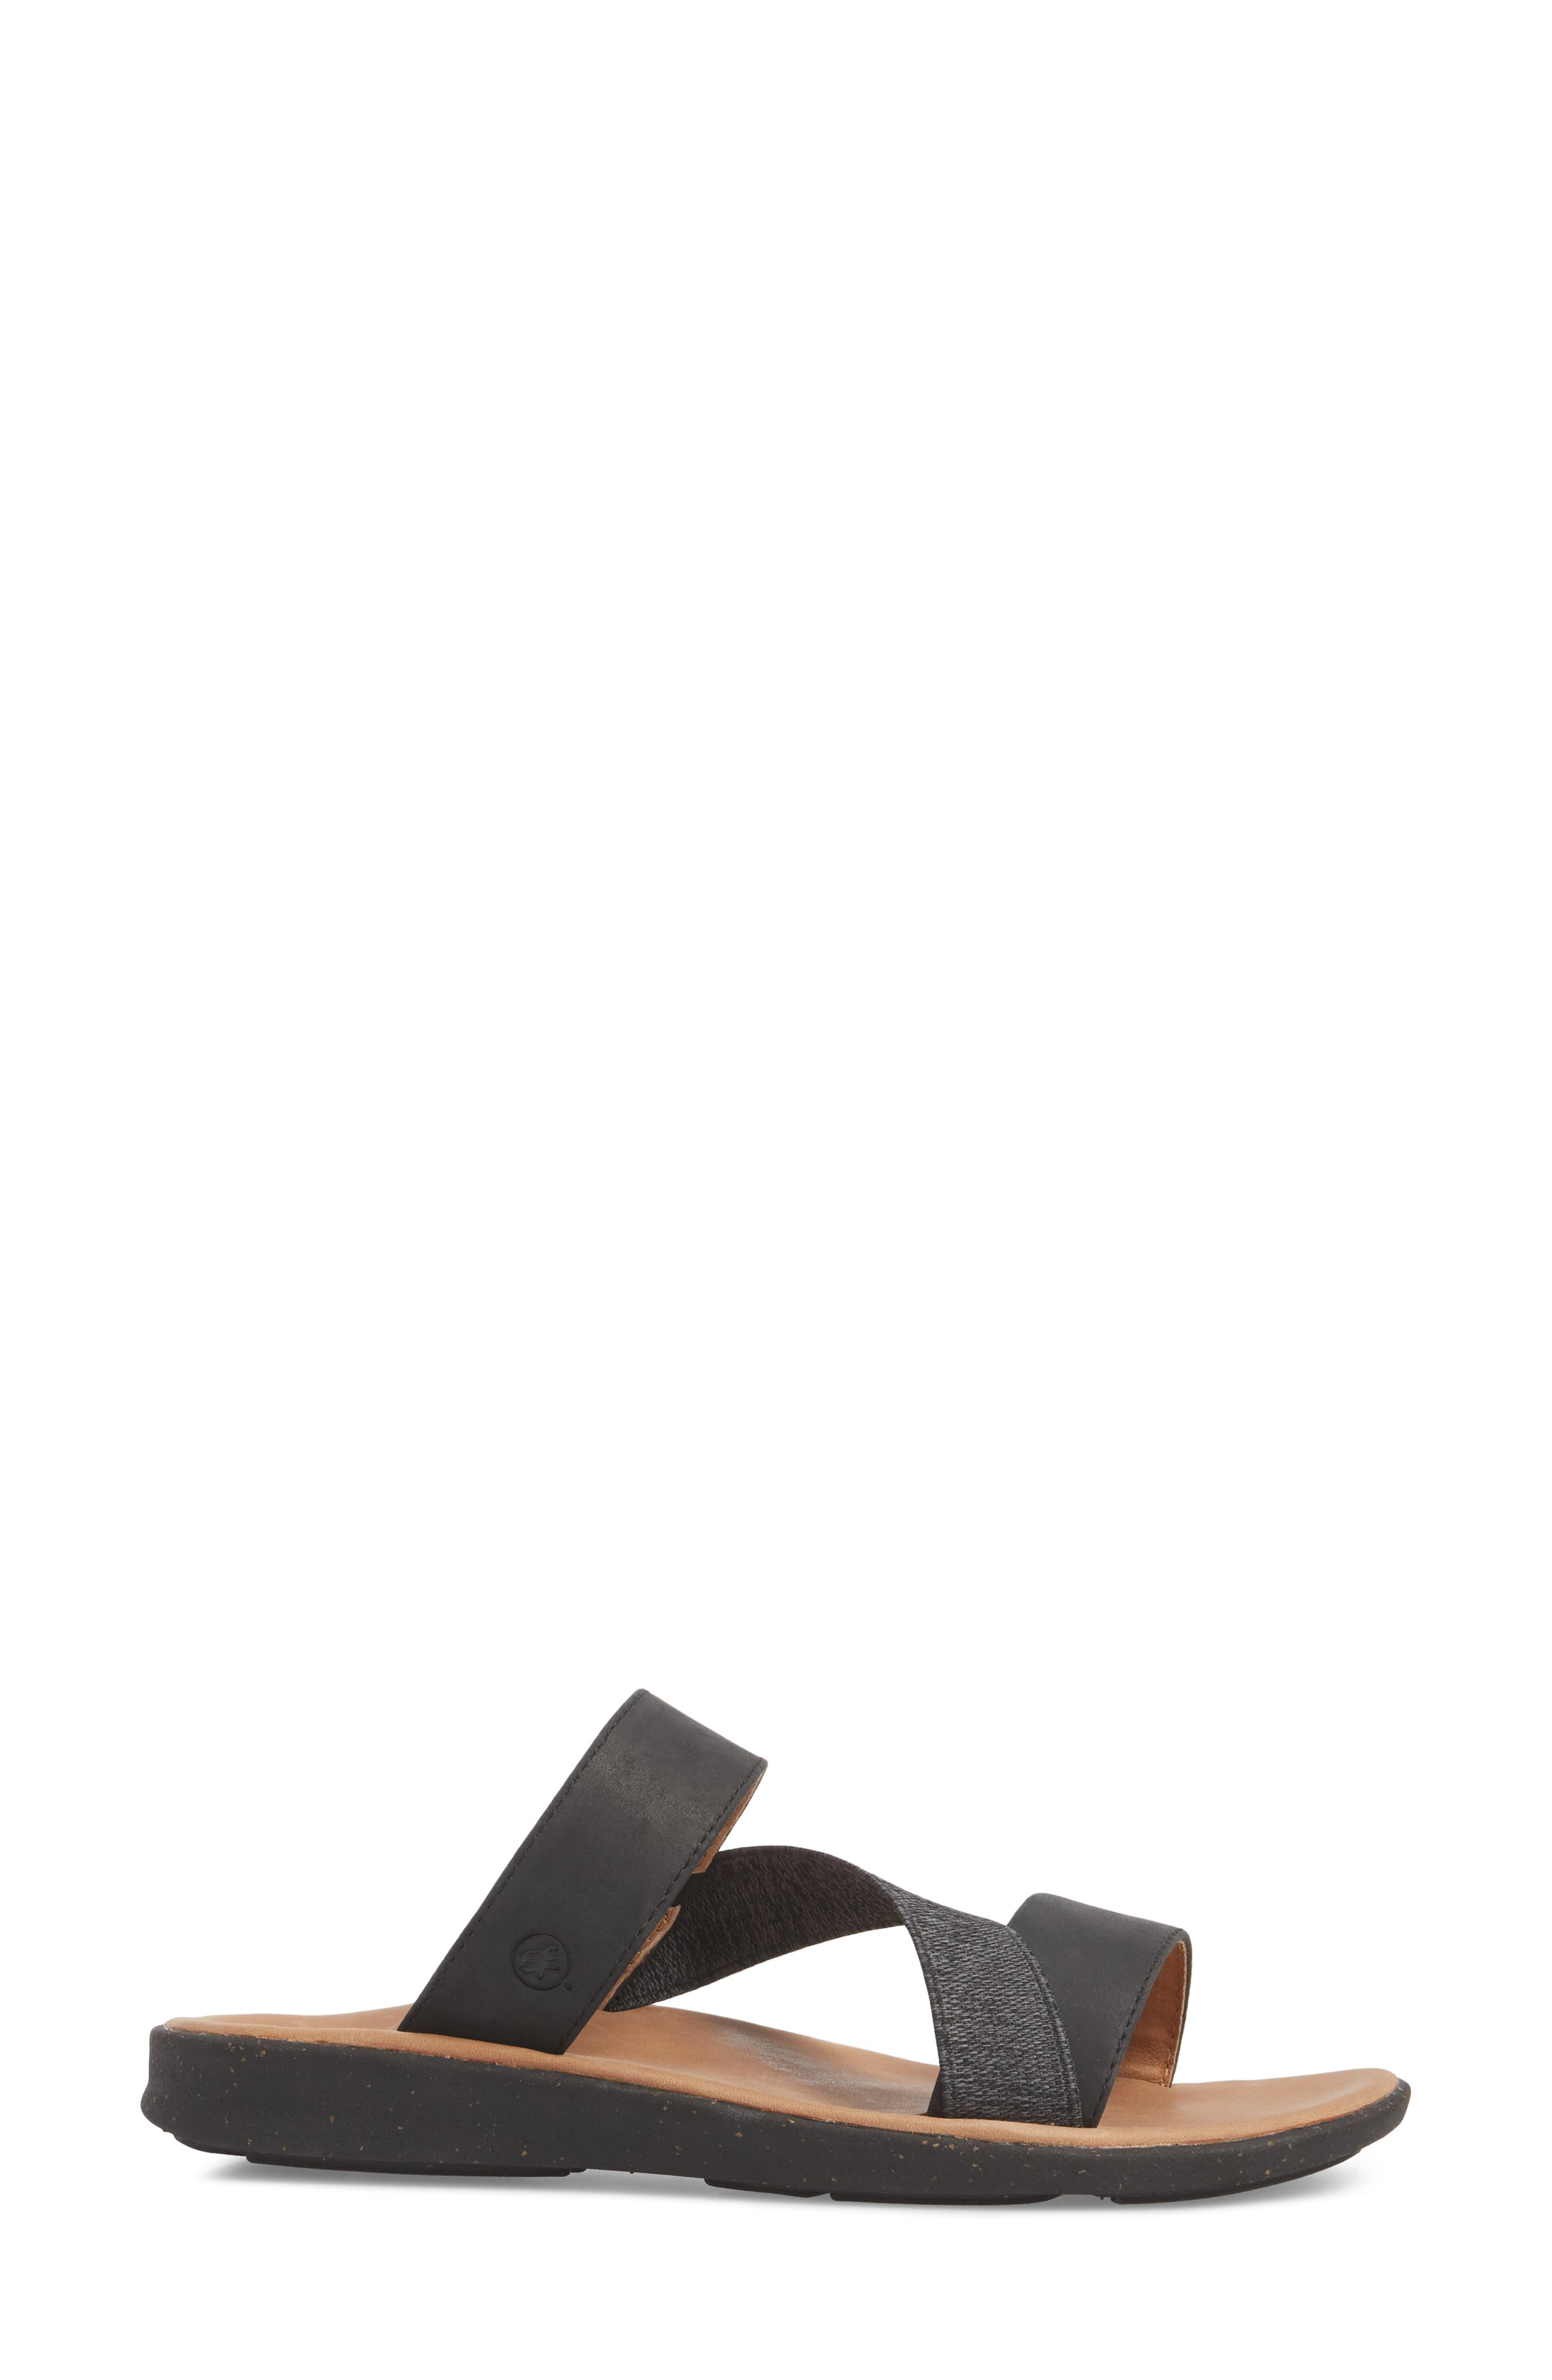 Reyes Slide Sandal,                             Alternate thumbnail 3, color,                             BLACK LEATHER